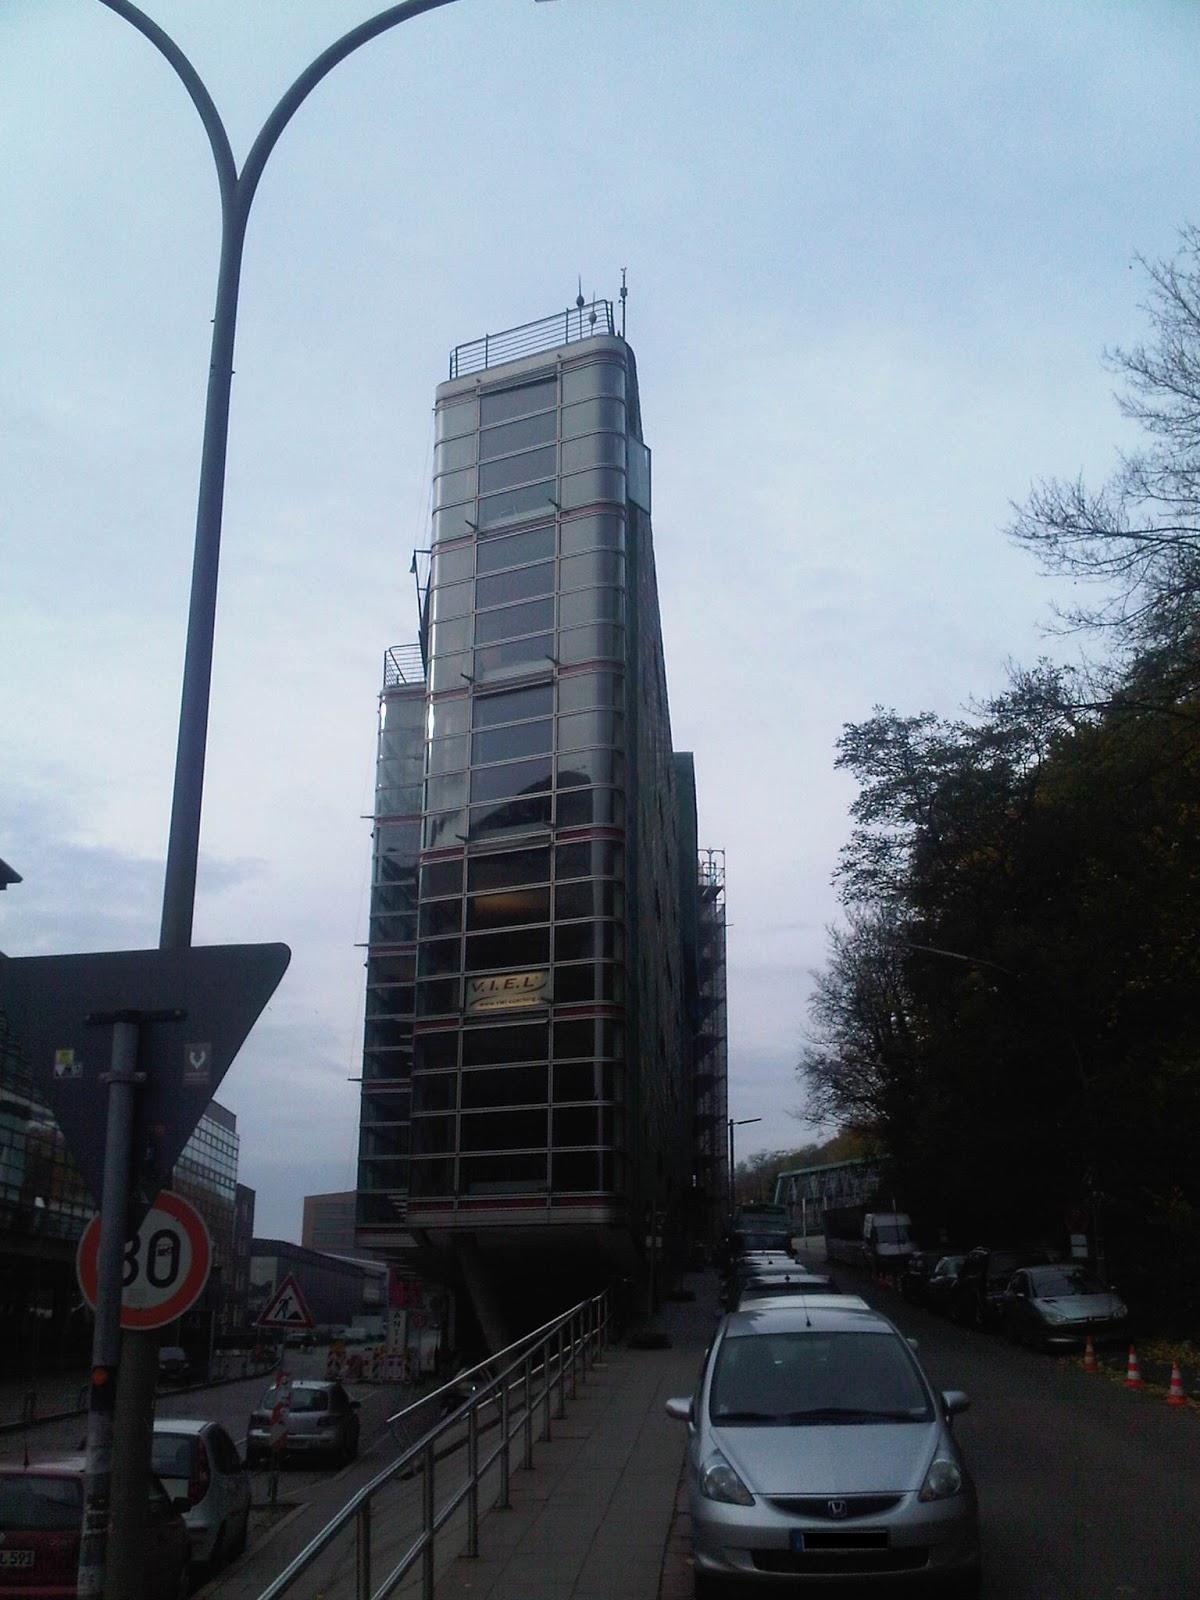 Unteres Ende Elbberg - Bürogebäude